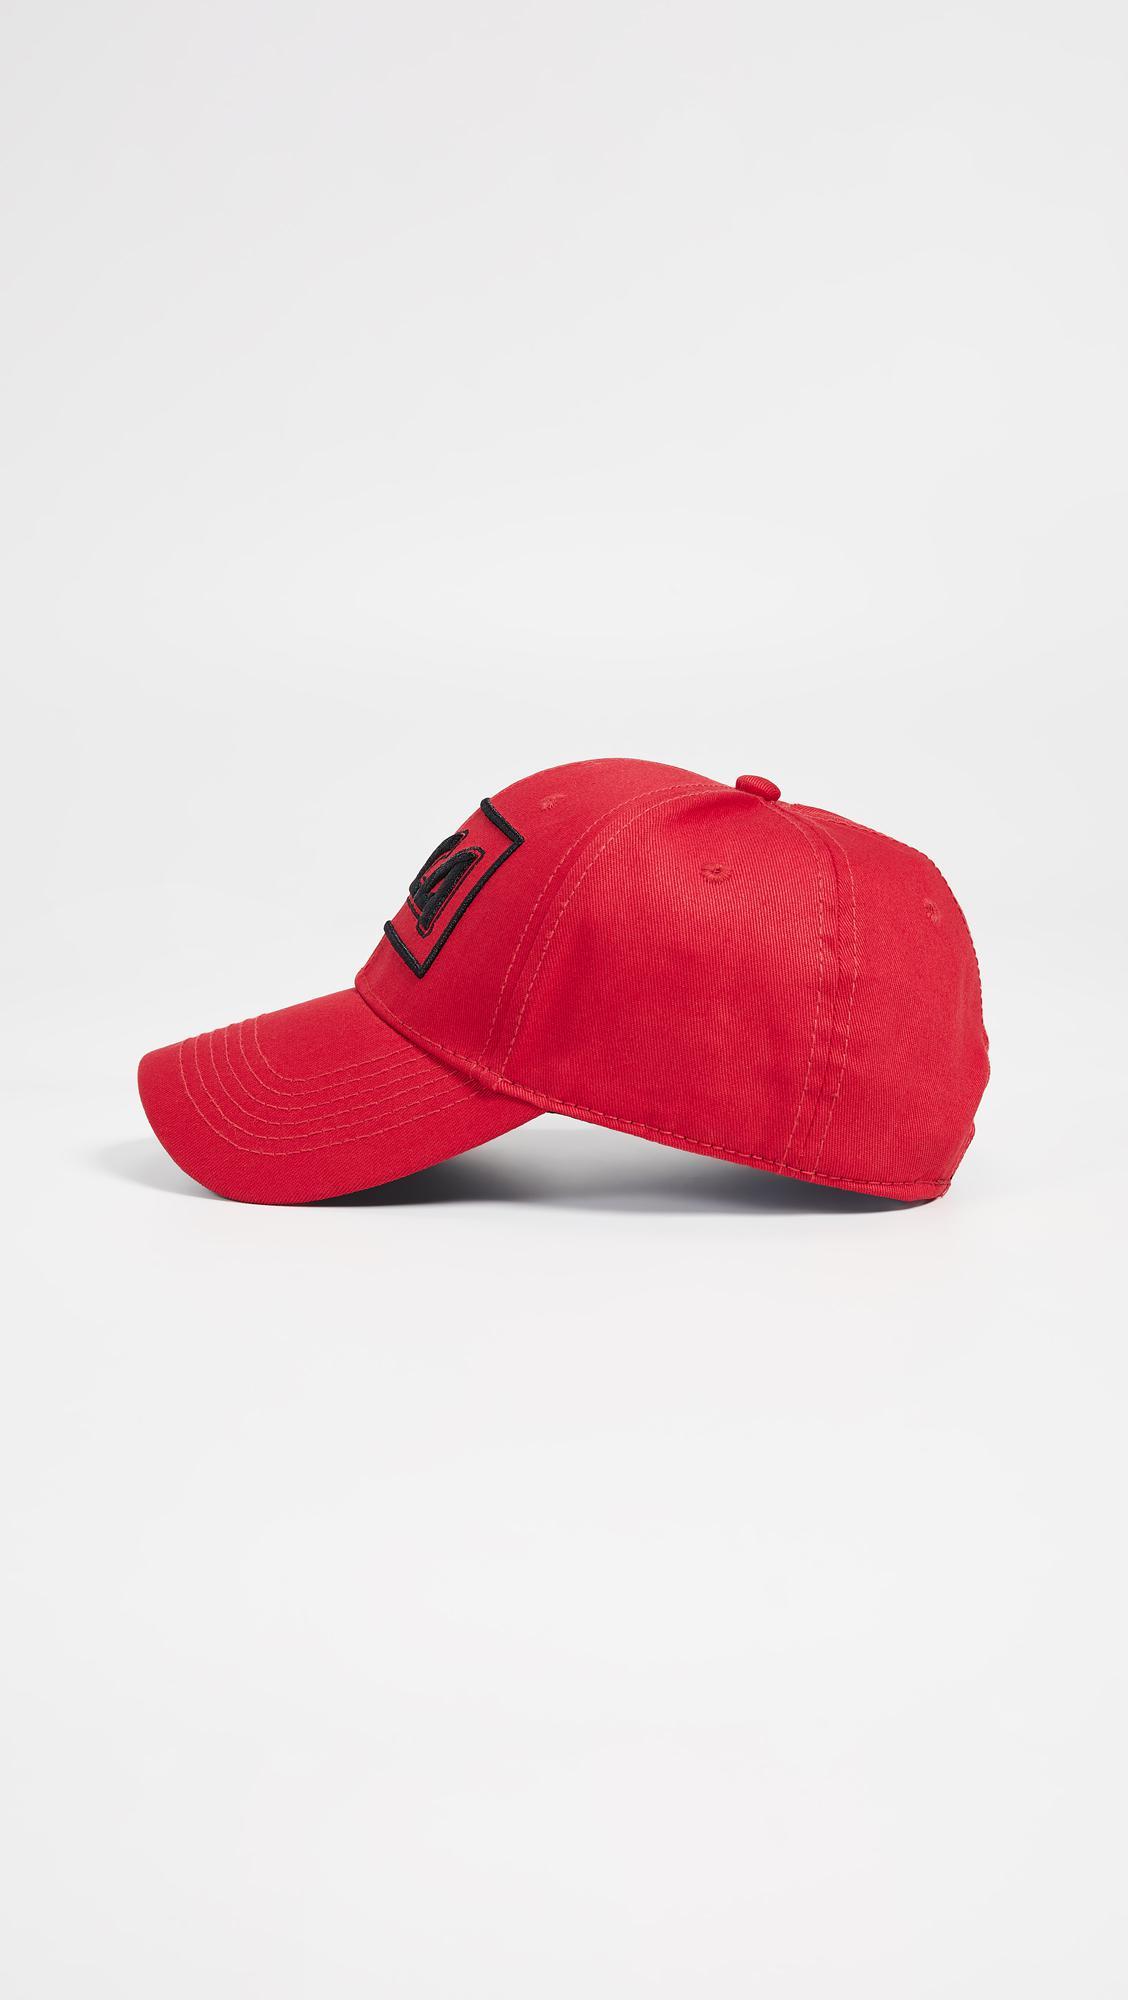 McQ Alexander McQueen - Red Metal Logo Baseball Cap for Men - Lyst. View  fullscreen c56f7106b8dd